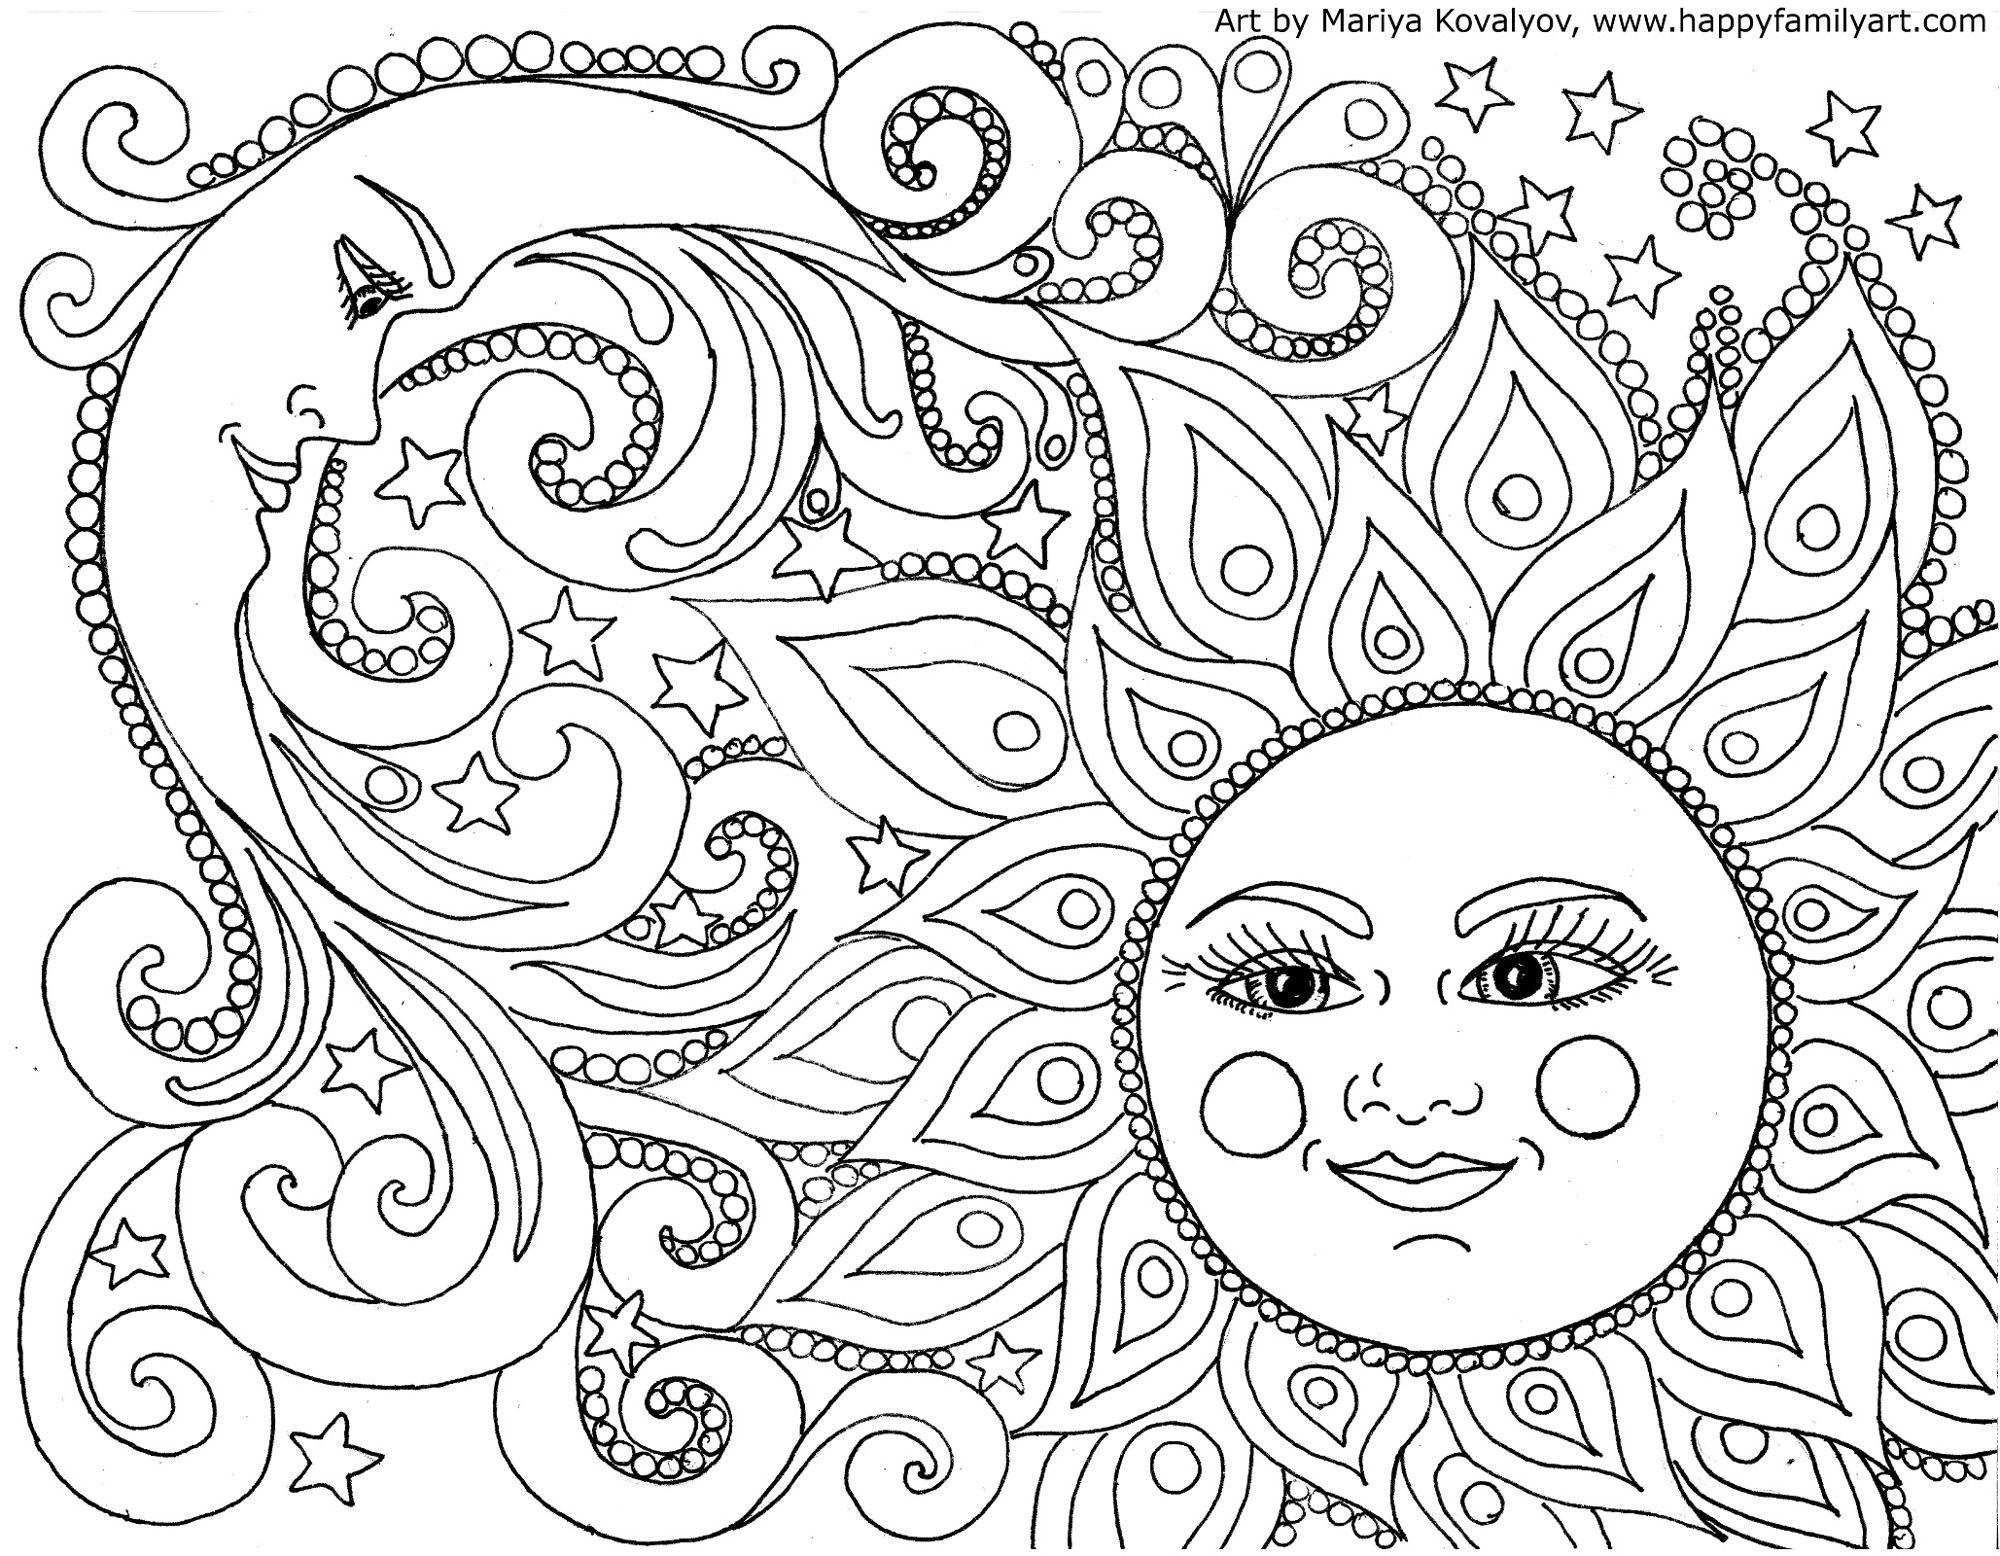 Original and fun coloring pages riscos colorir e para colorir